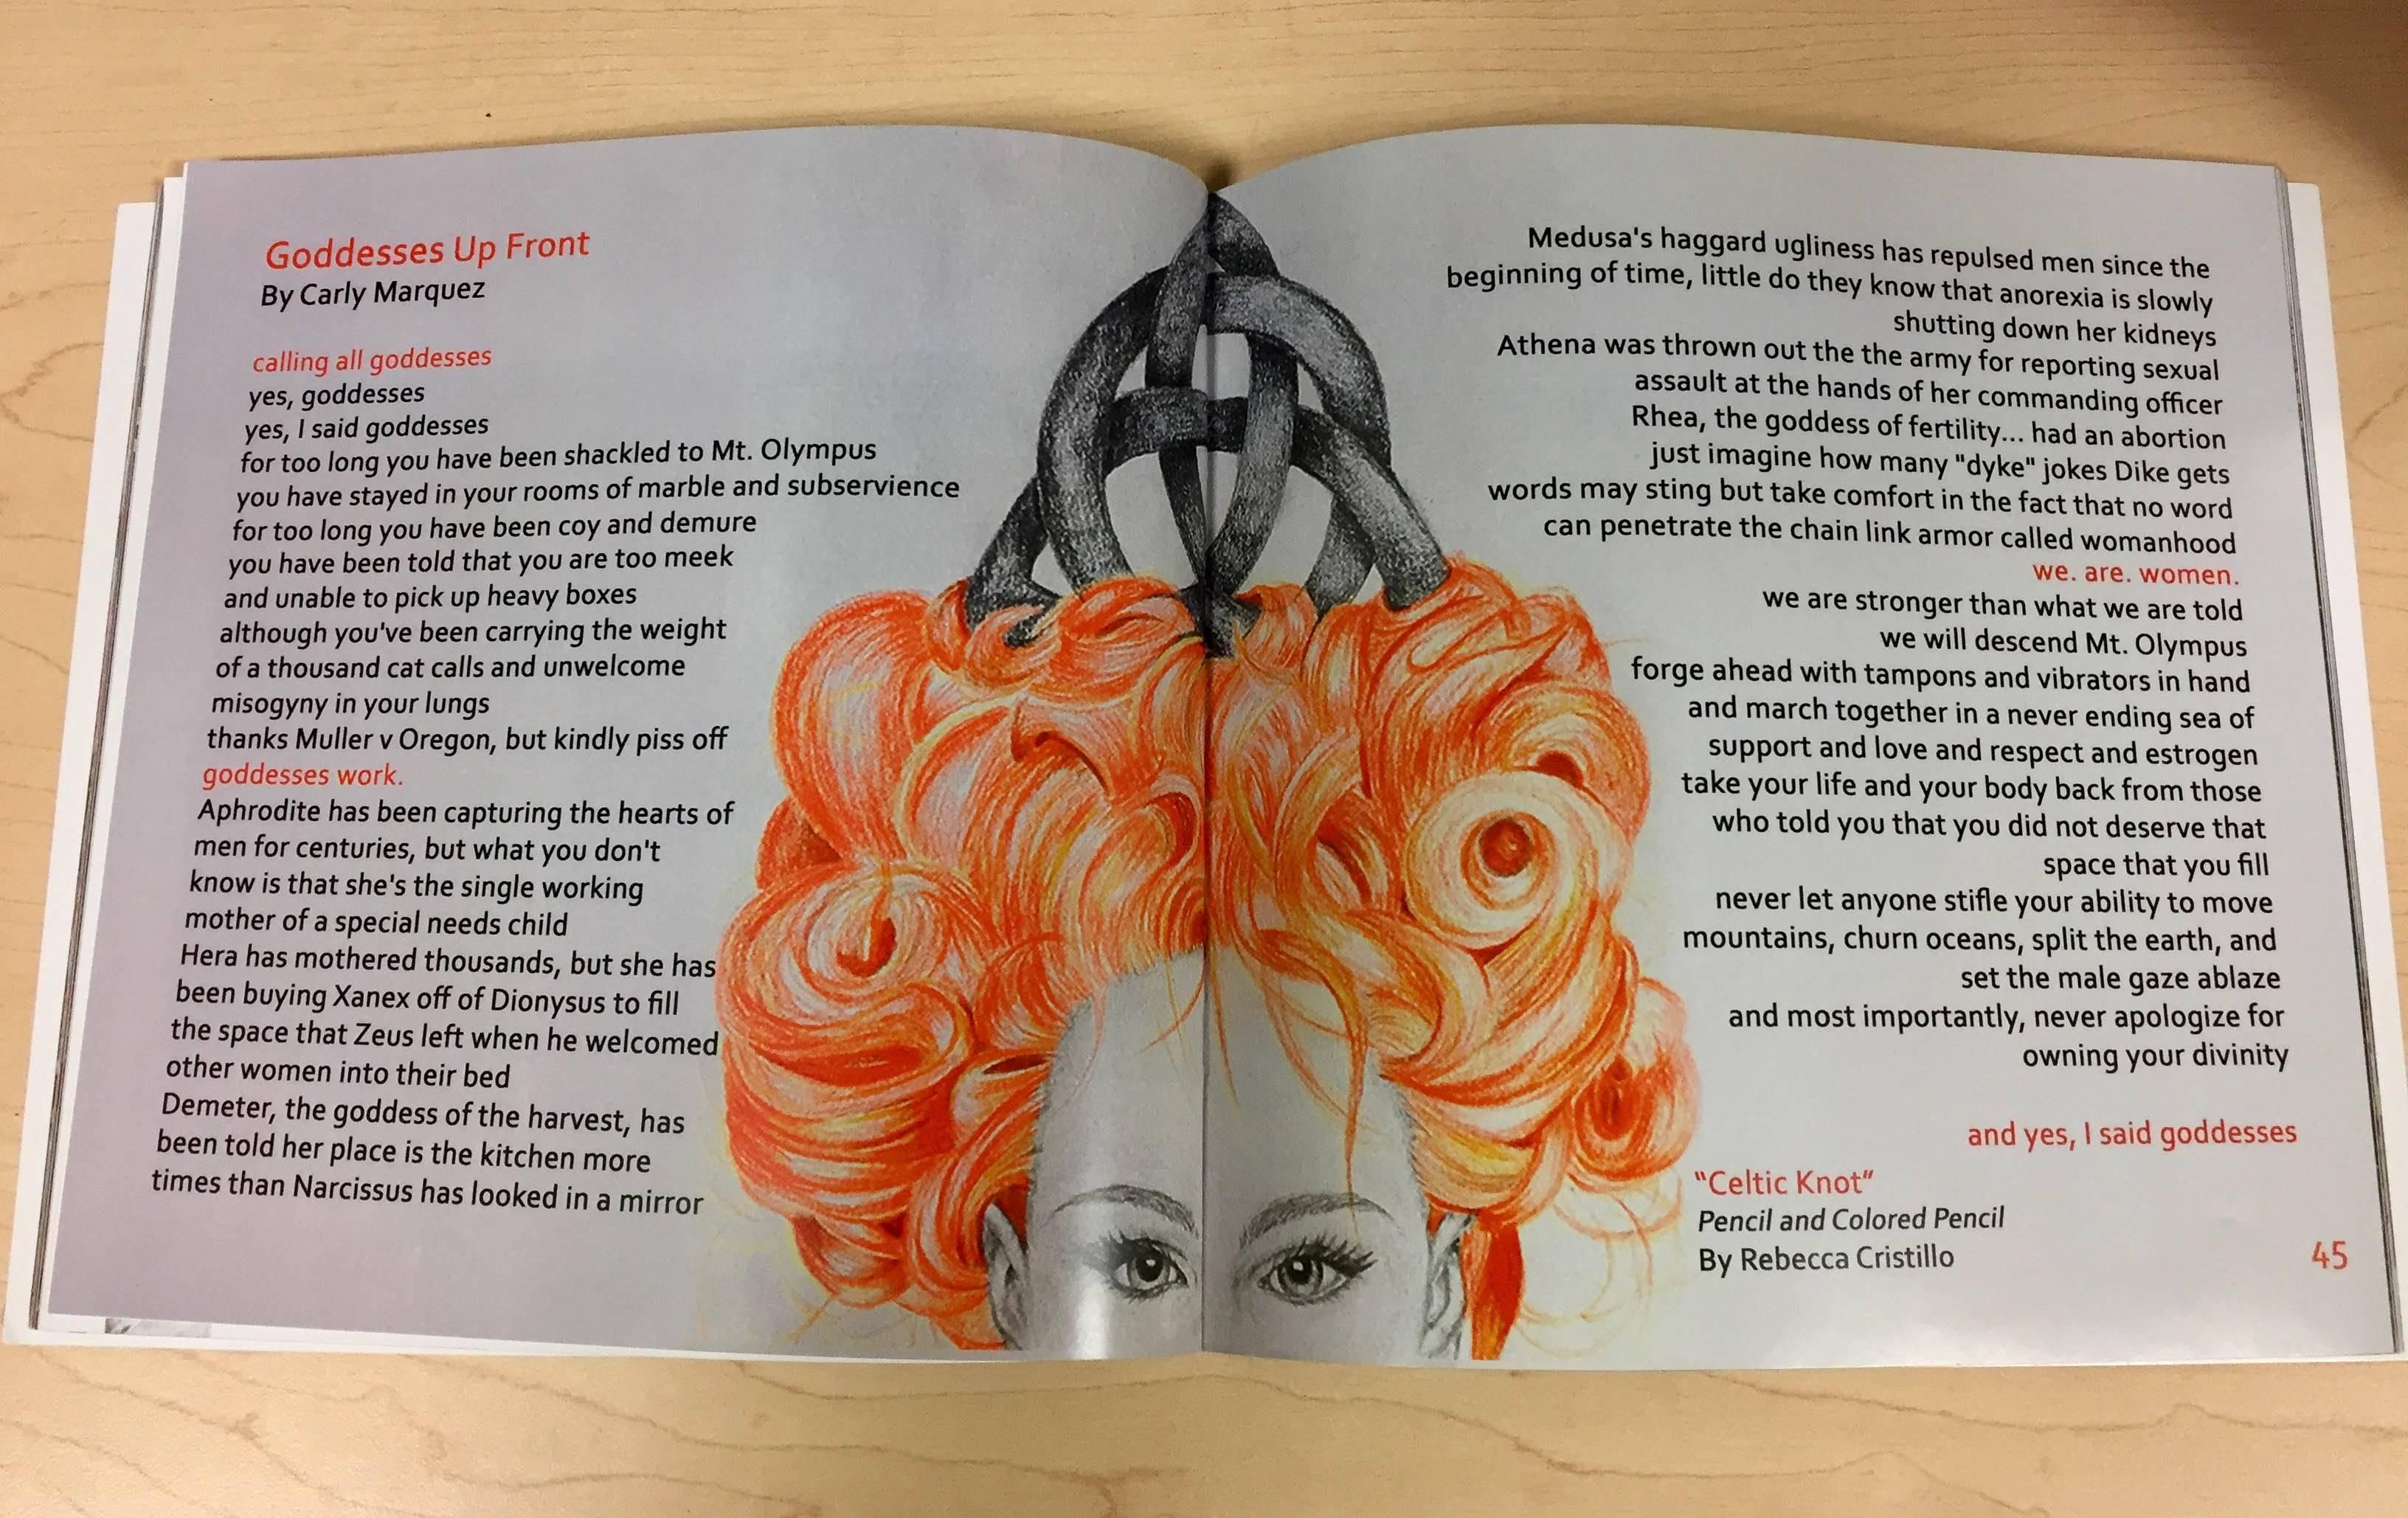 Literary Magazines WorldNewspaperscom - mandegar info